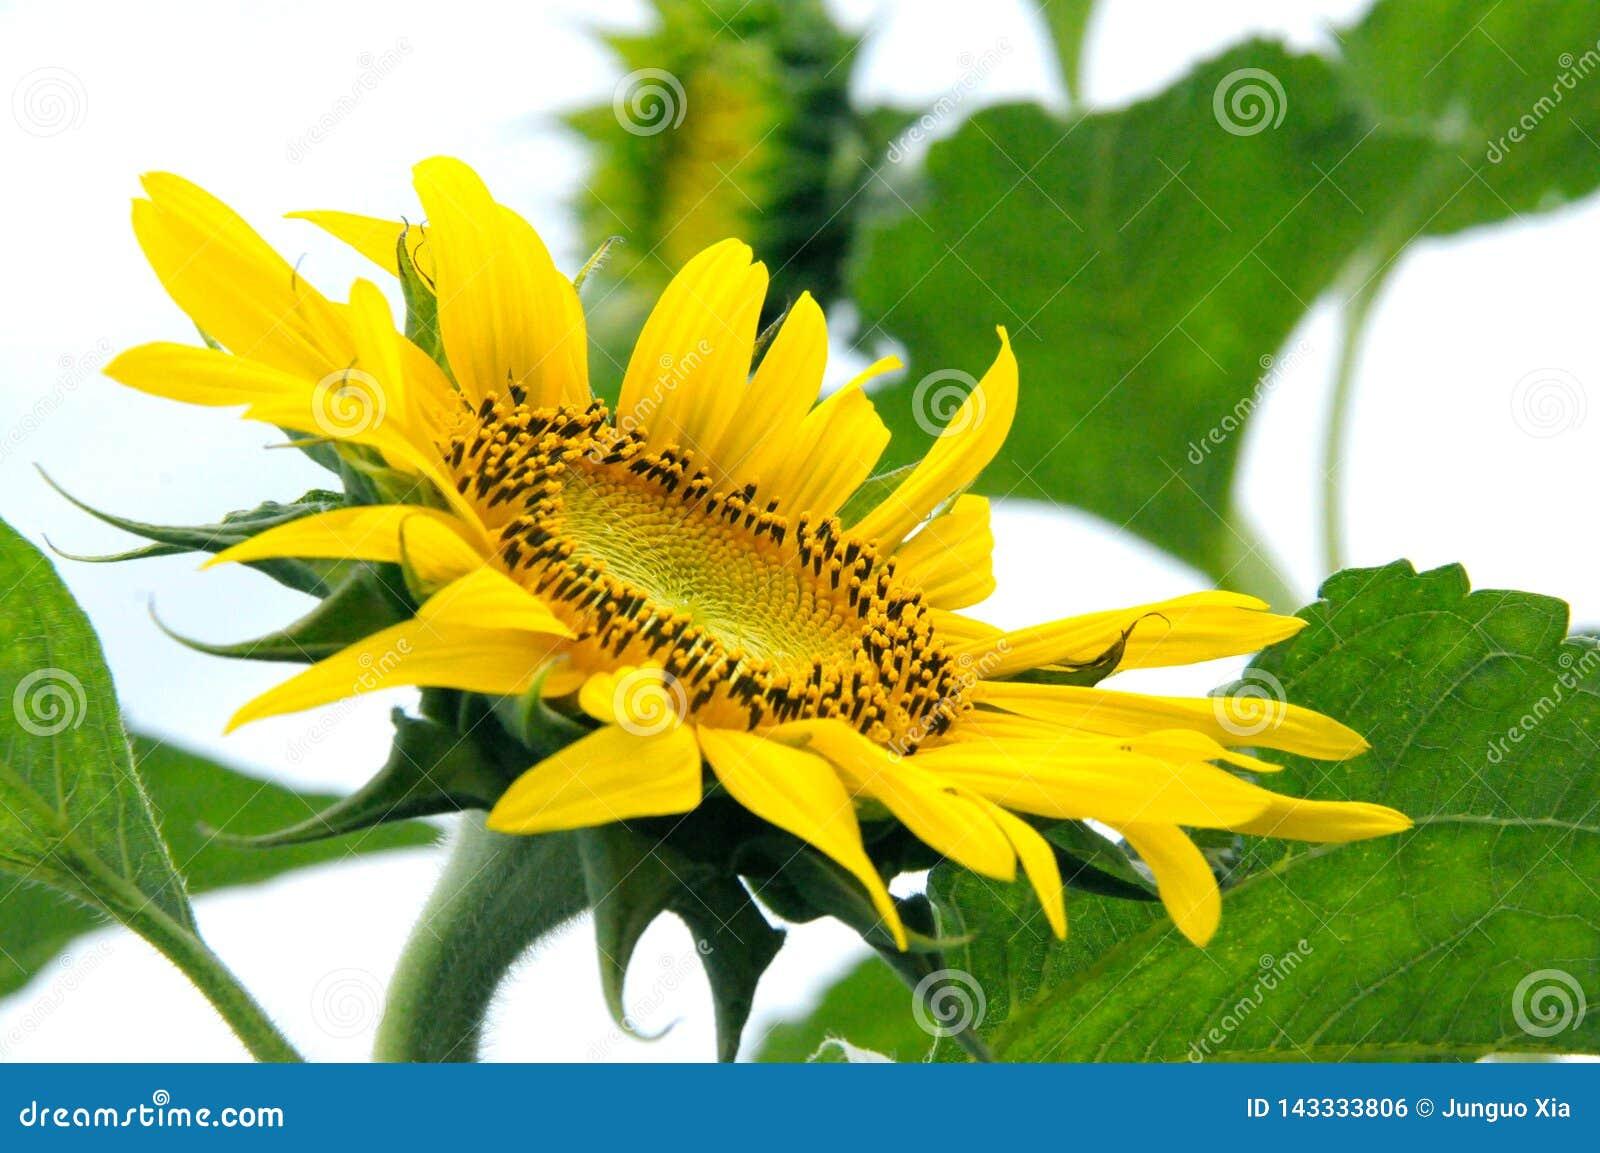 Beau tournesol jaune naturel dans le jardin